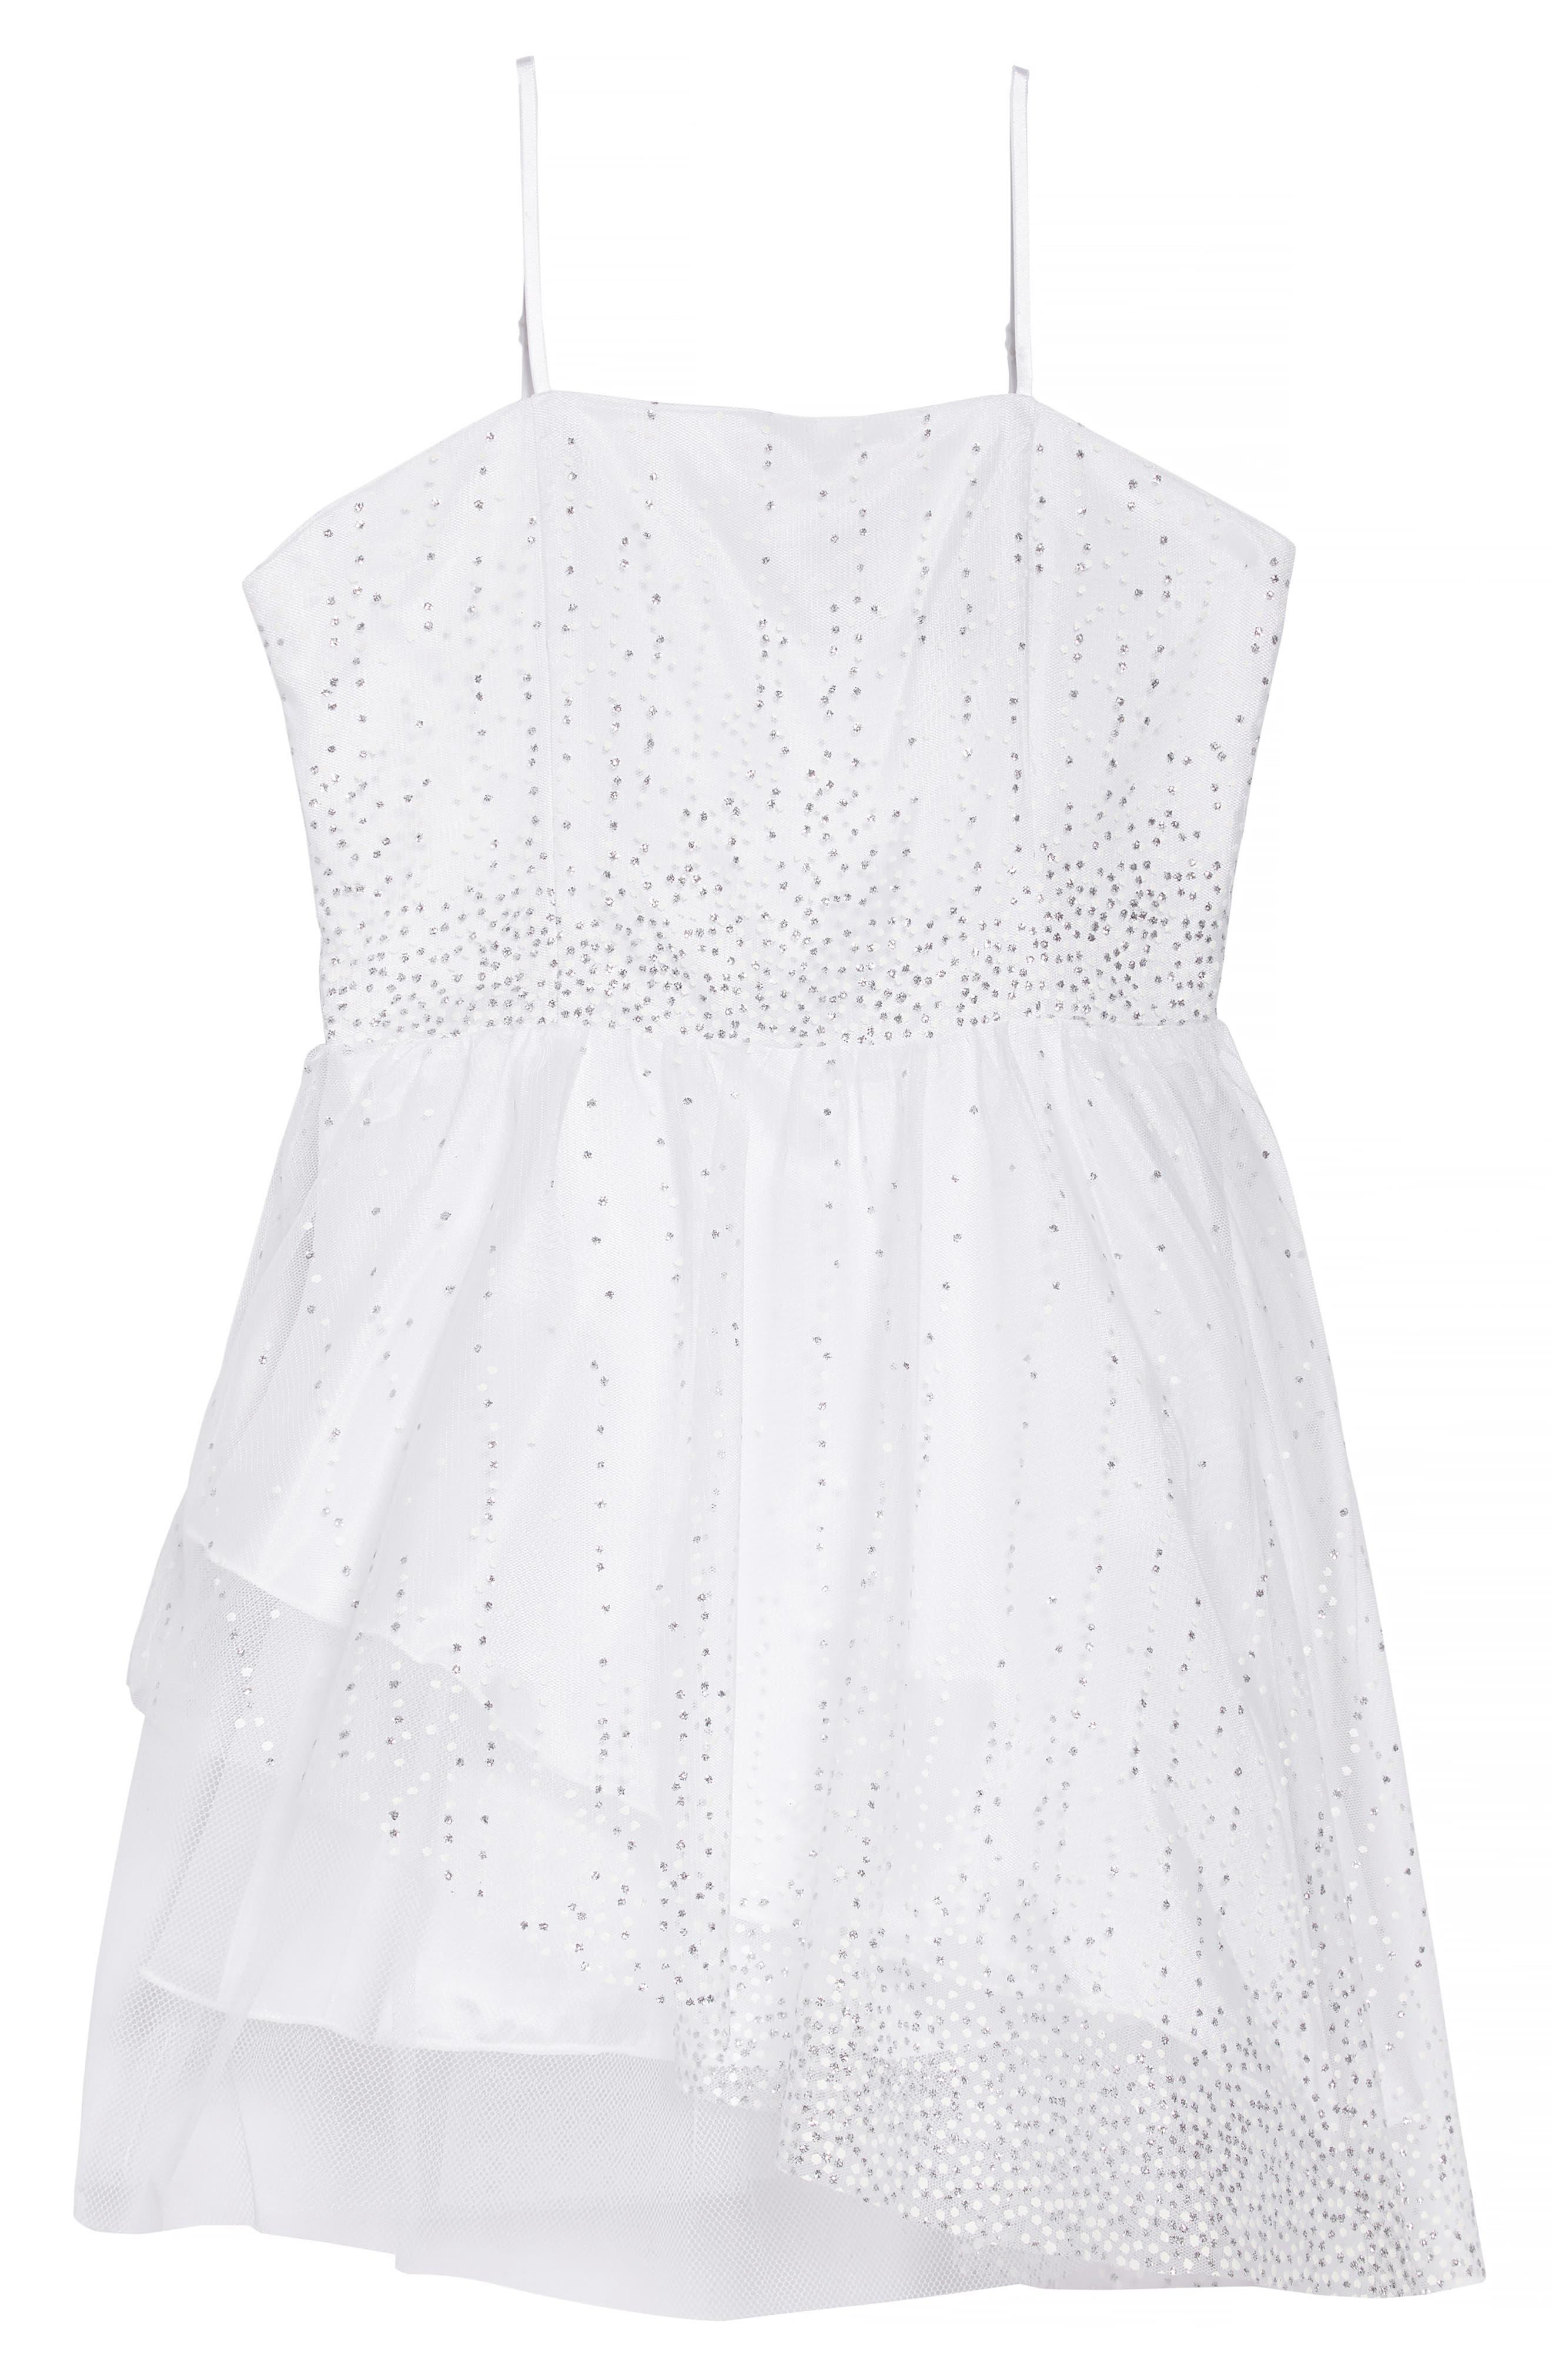 Sequin Dress,                             Main thumbnail 1, color,                             White/ Silver